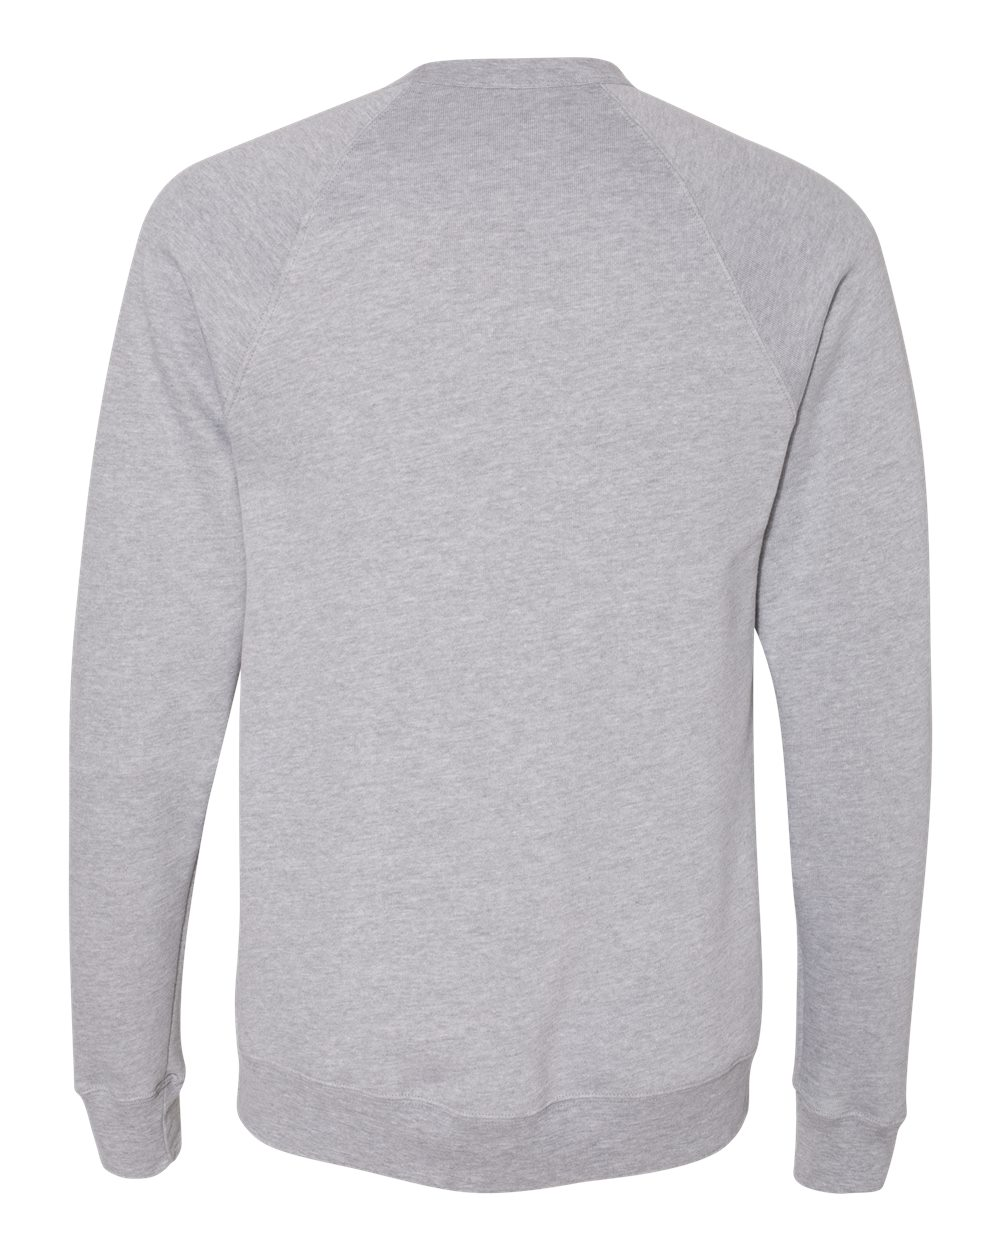 Bella-Canvas-Unisex-Sponge-Fleece-Crewneck-Sweatshirt-Top-Blank-3901-up-to-2XL thumbnail 9